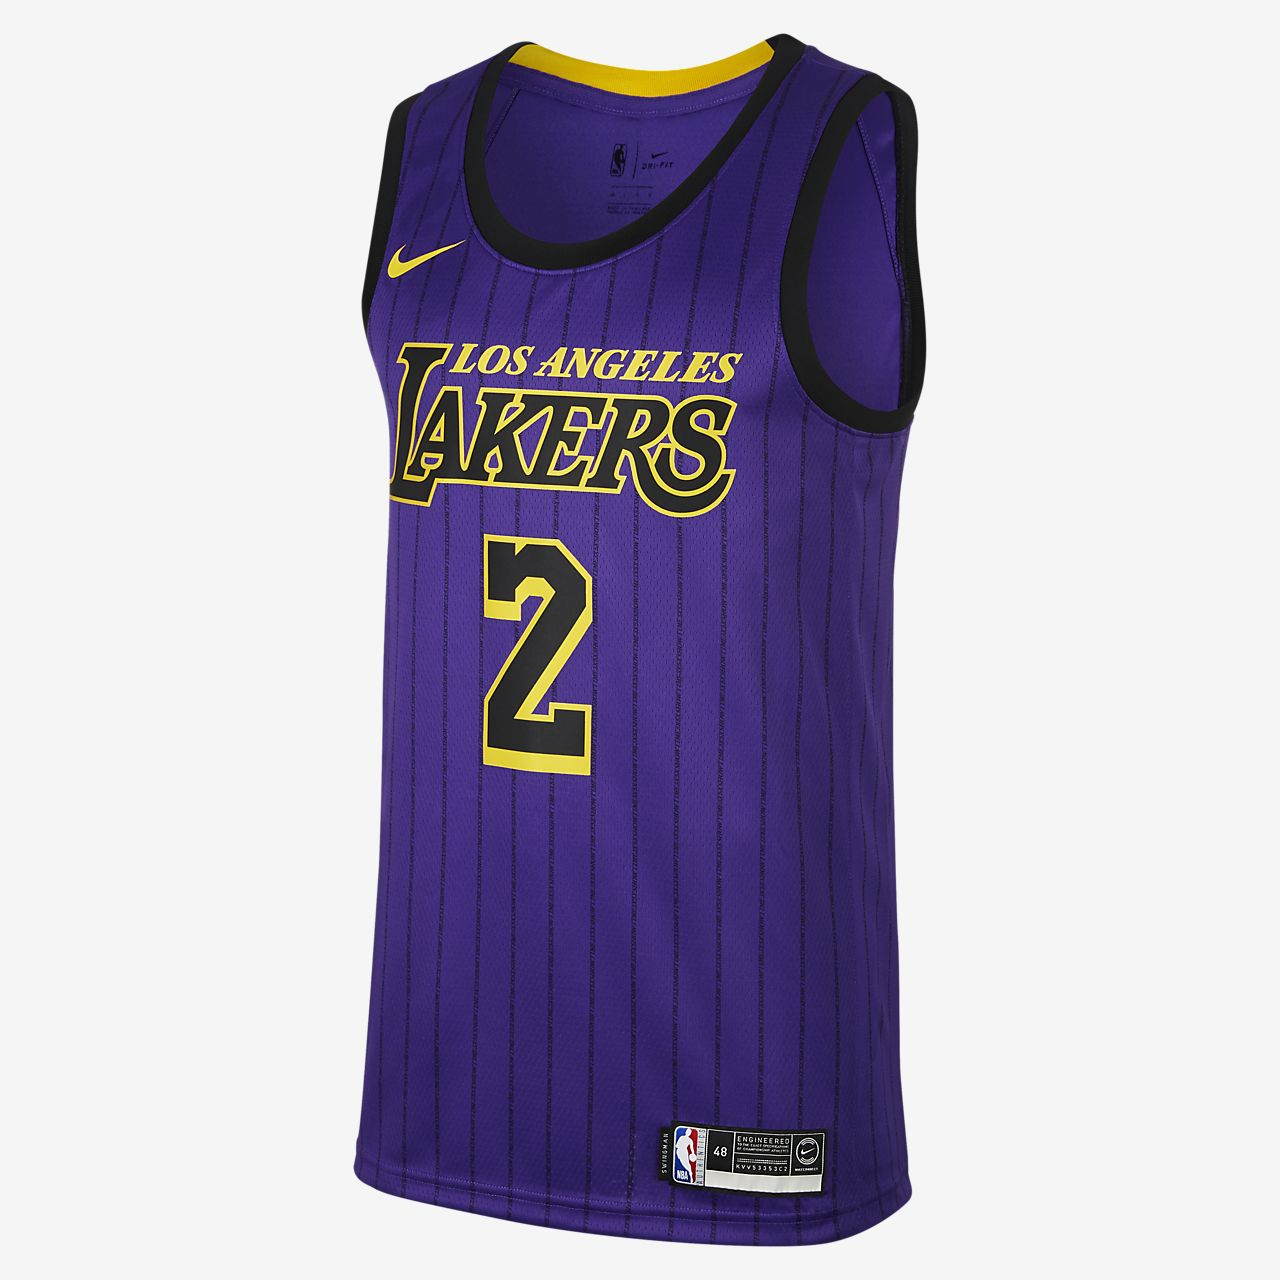 Pánský dres Nike NBA Connected Lonzo Ball City Edition Swingman (Los Angeles Lakers)